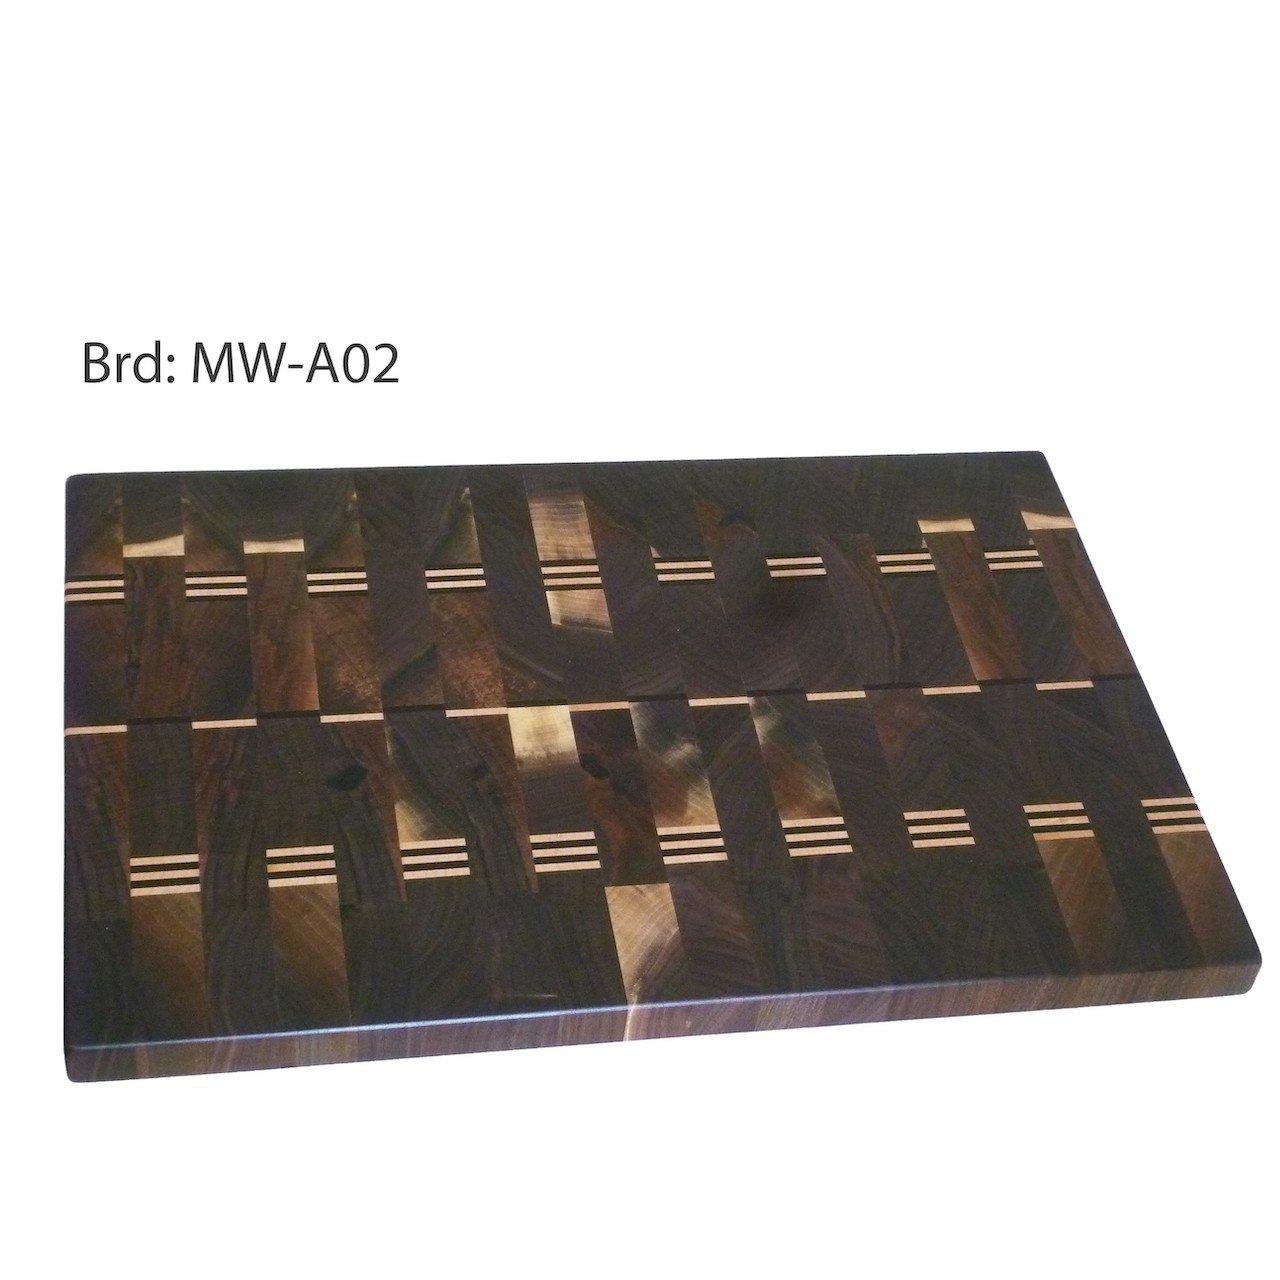 MW-A02